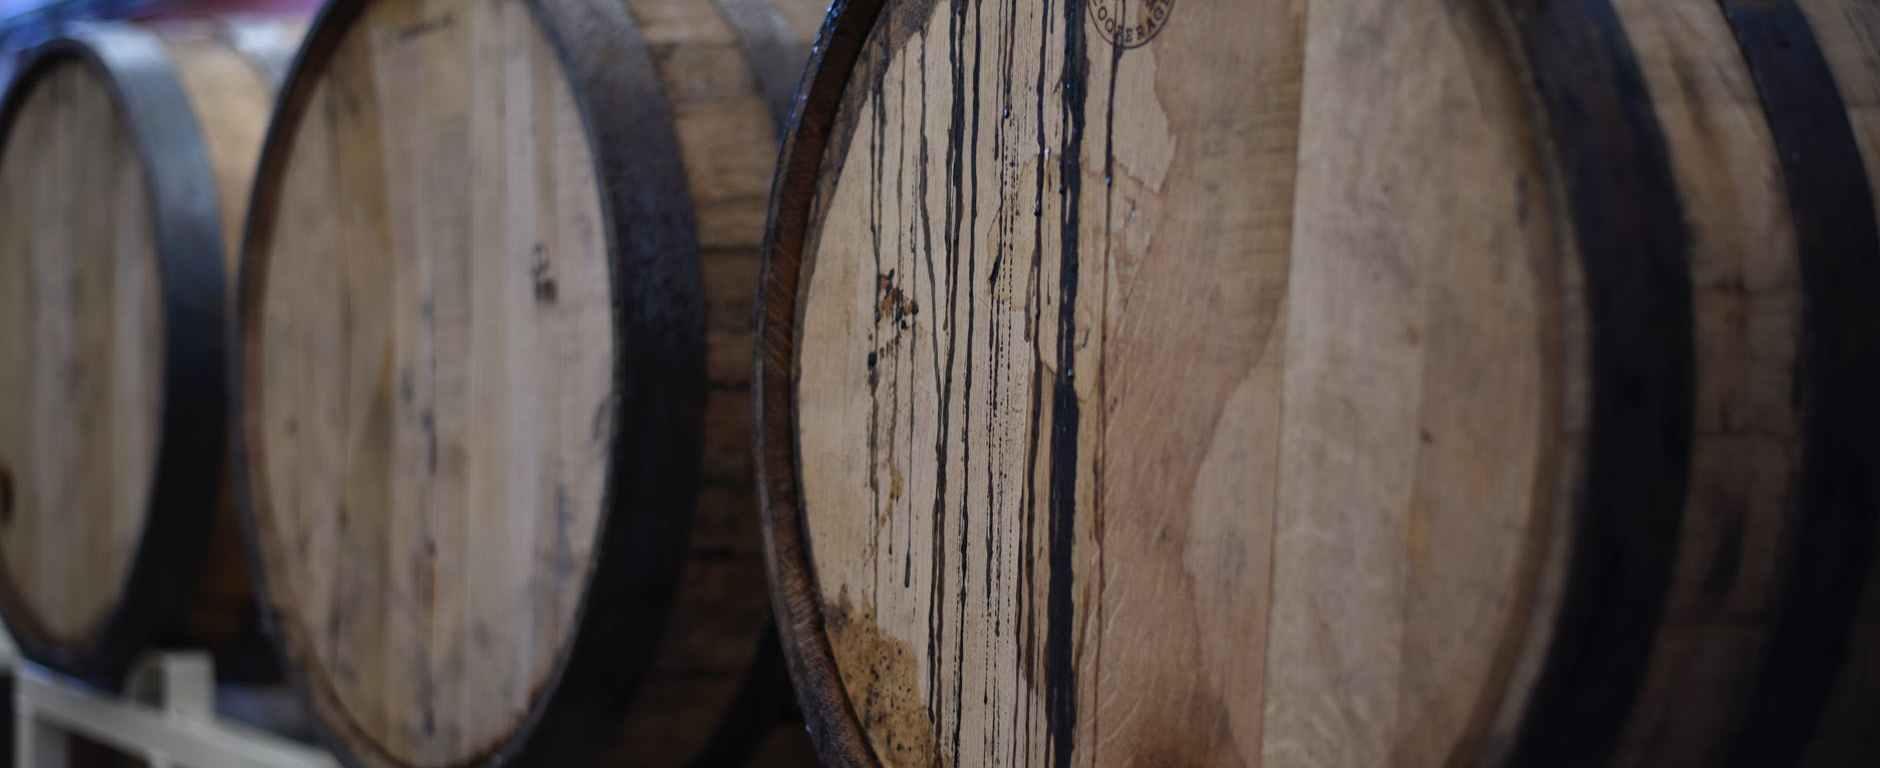 barrels on trailers